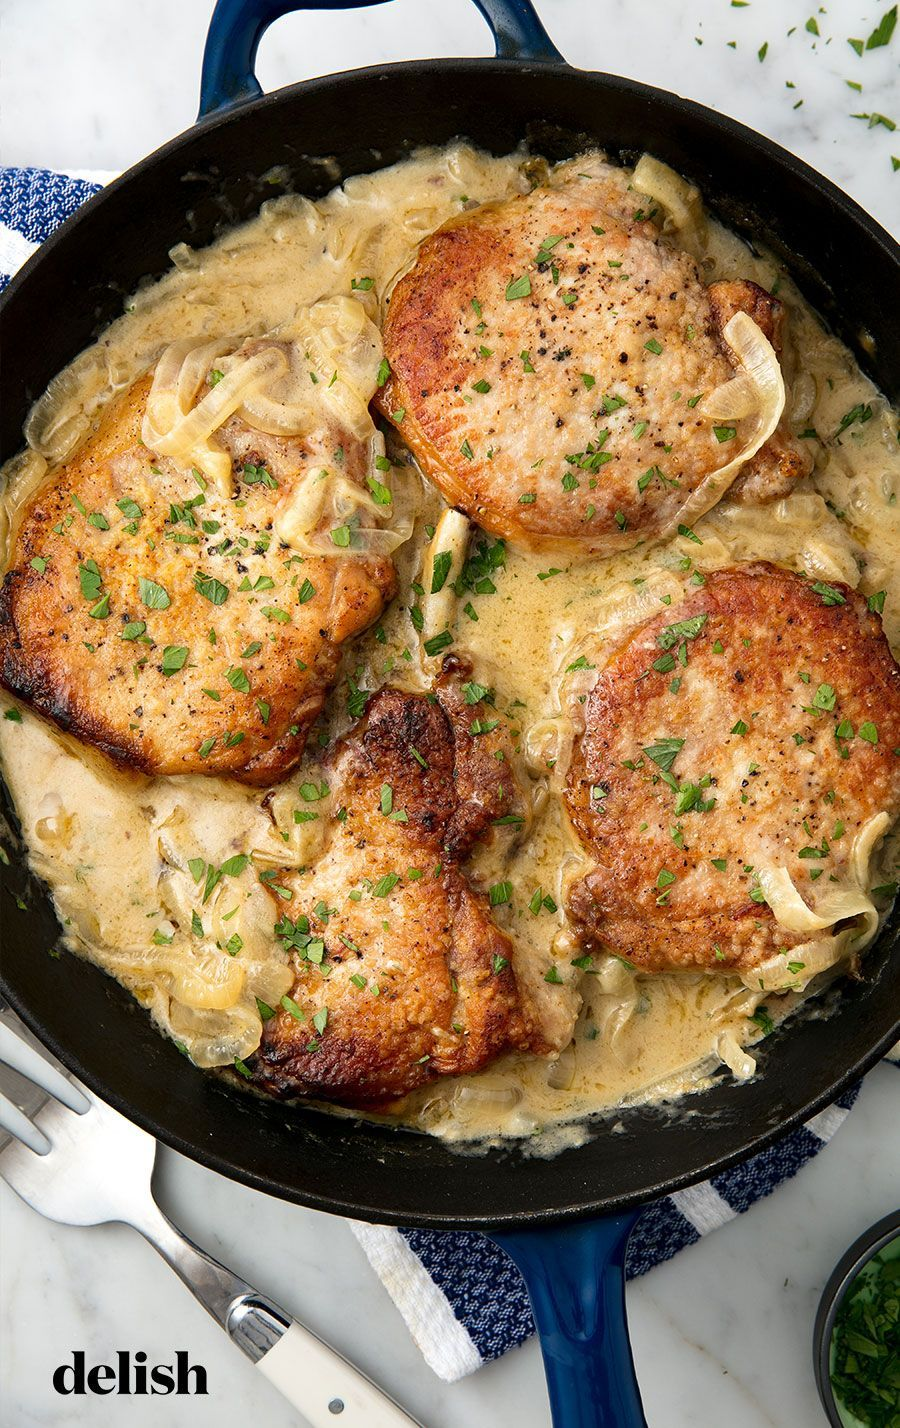 pork chop dinner ideas pinterest Smothered Pork Chops